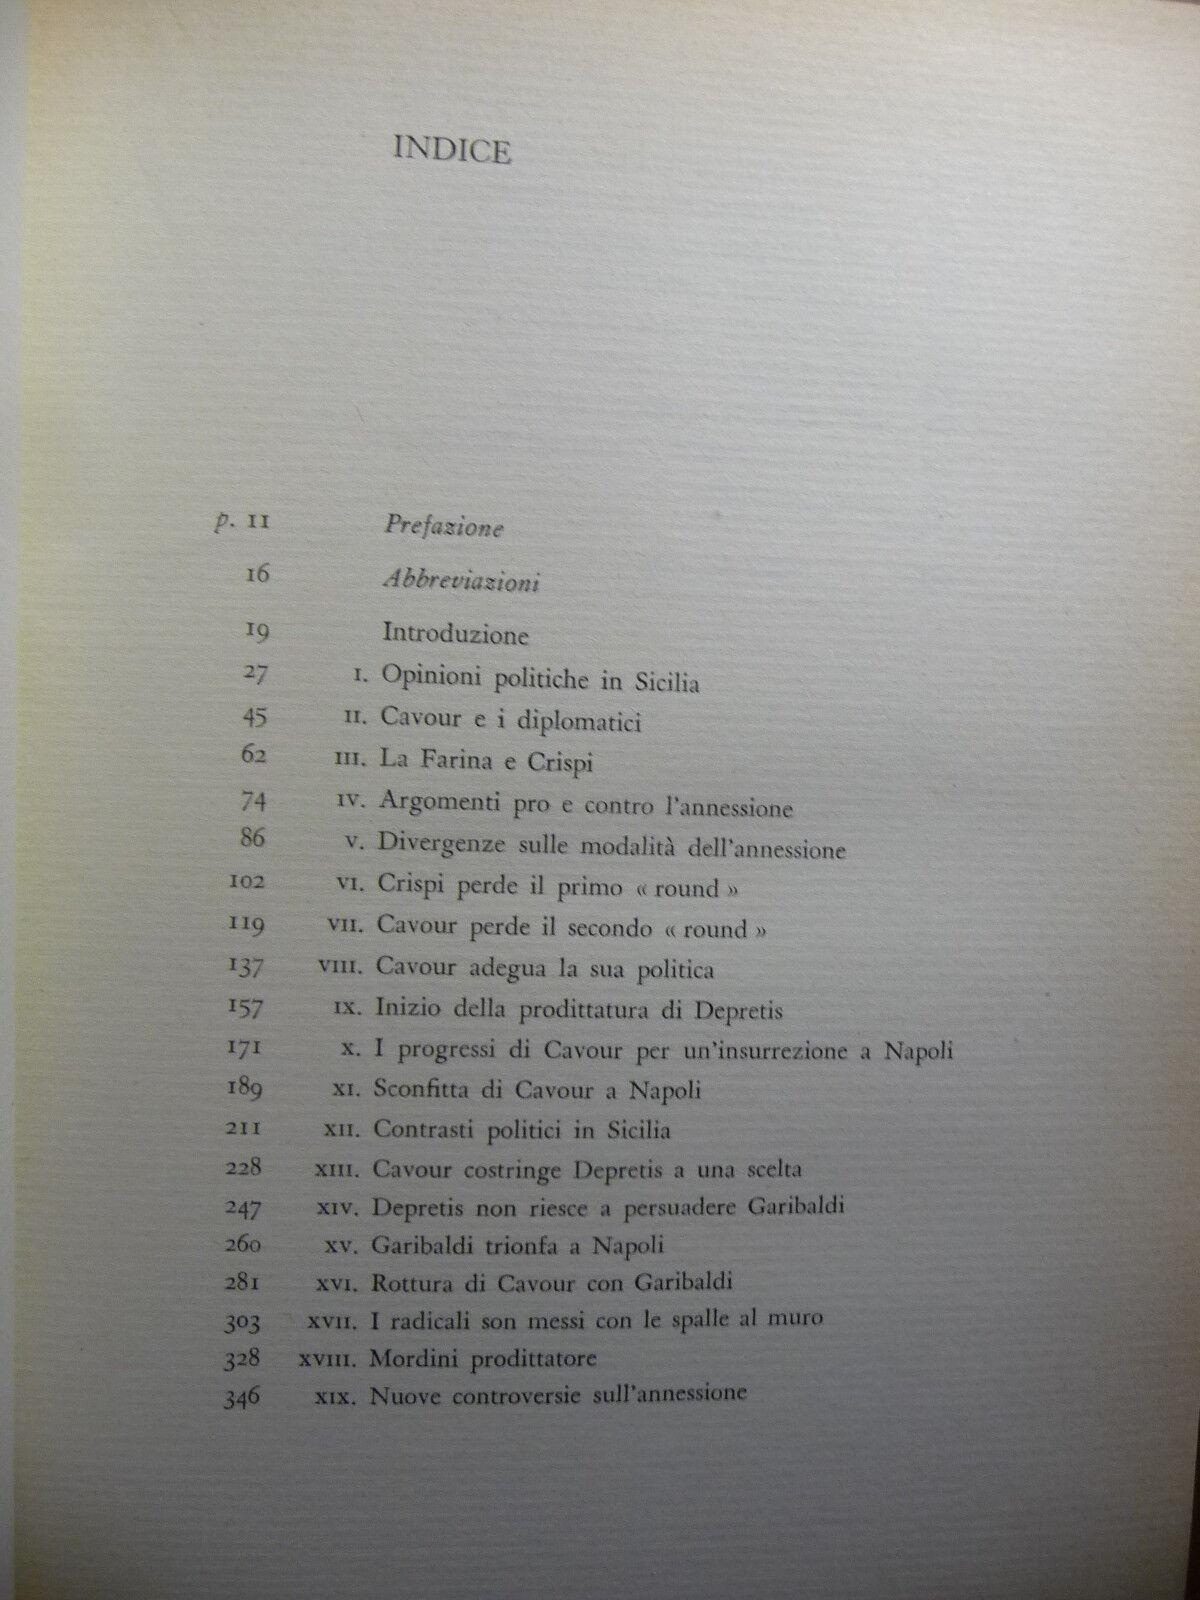 GARIBALDI E CAVOUR NEL 1860 DENIS MACK SMITH I^ Ed. 1958 BELLISSIMO VOLUME